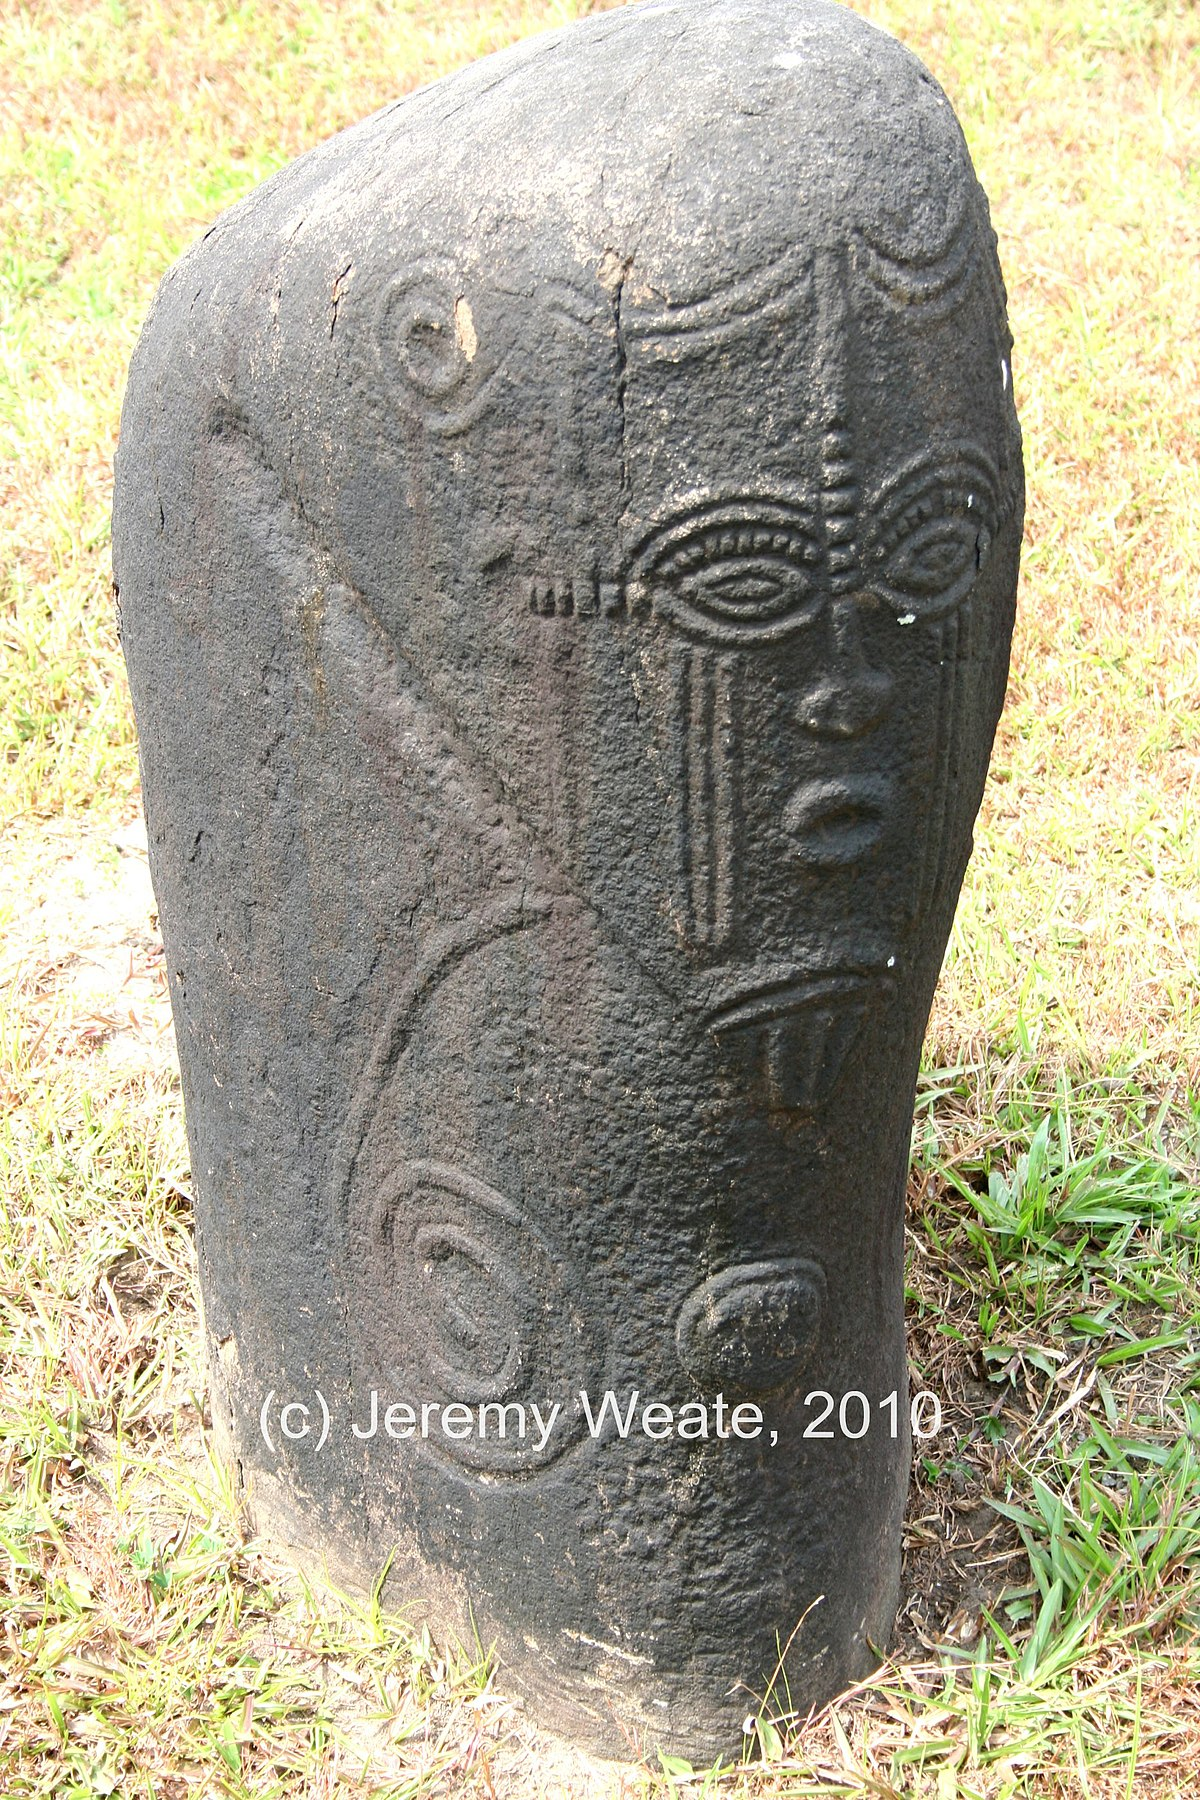 Ikom Monoliths Wikipedia